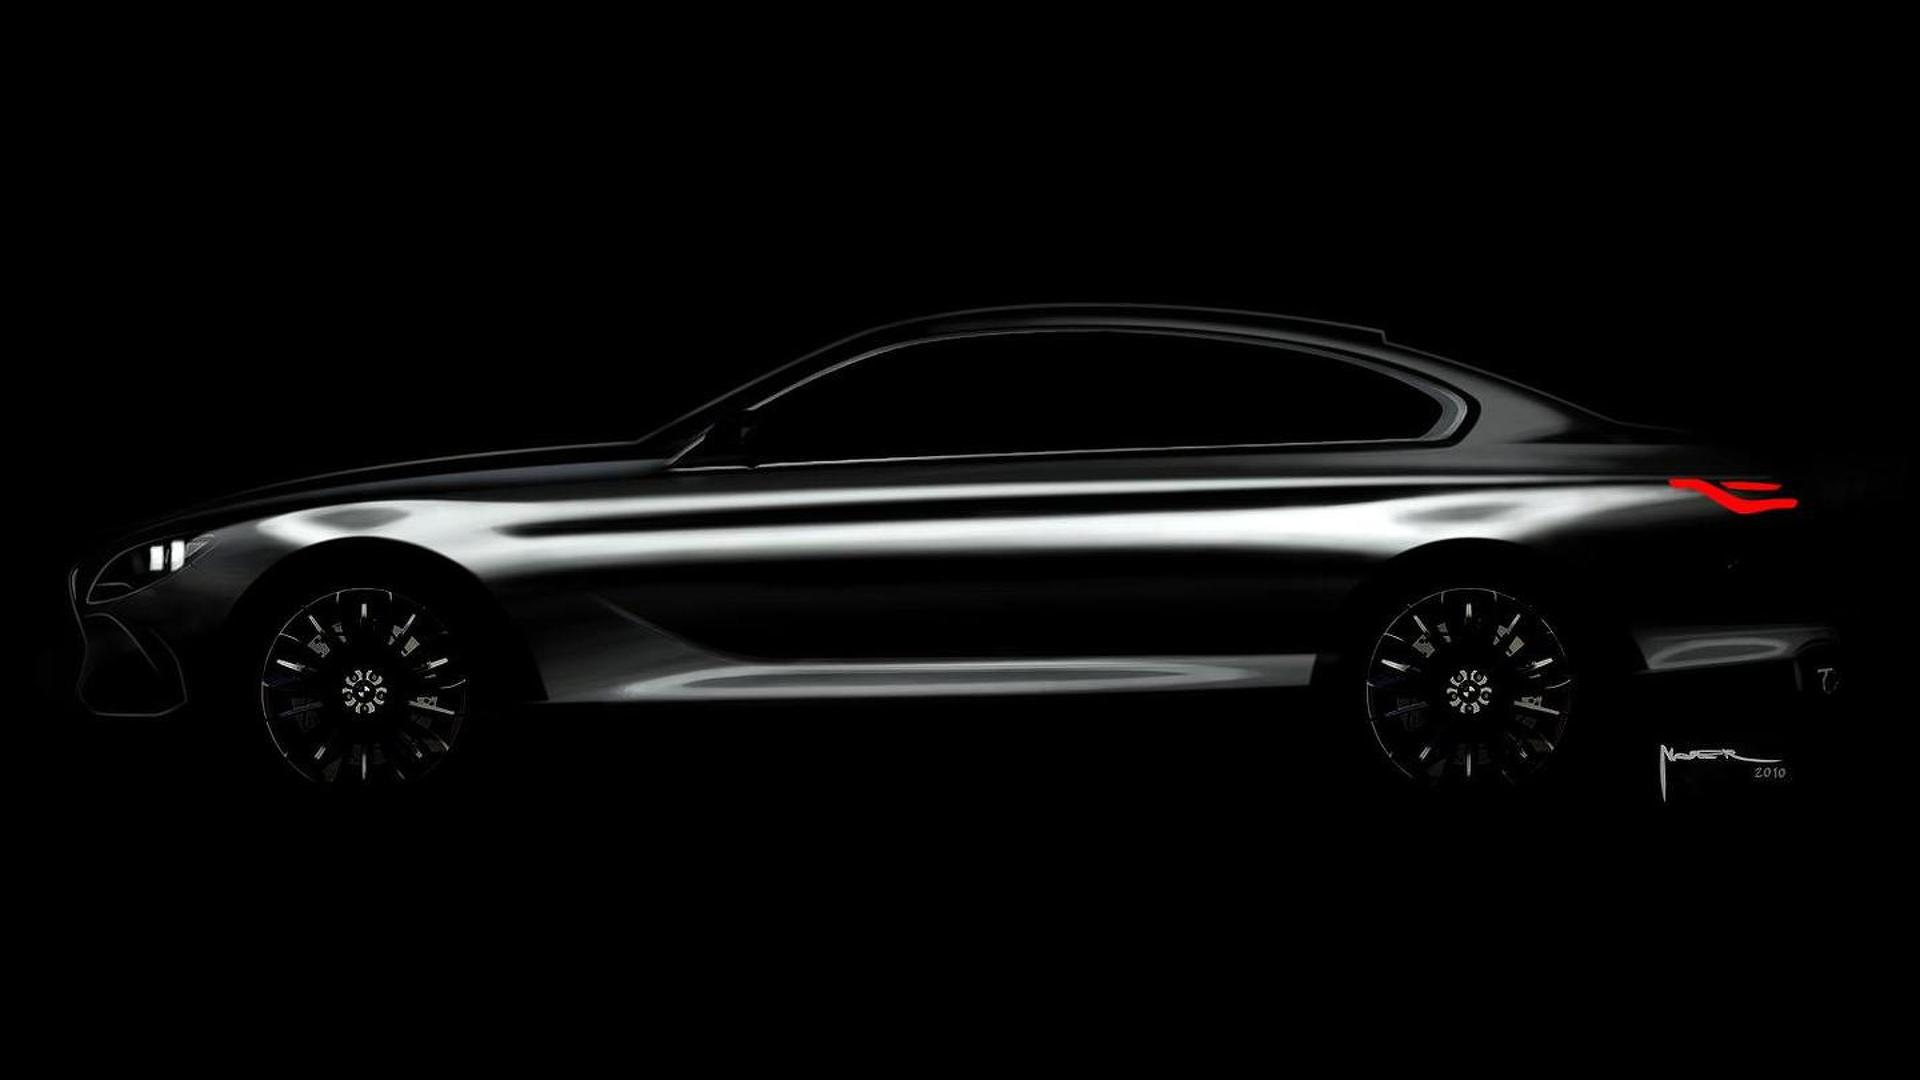 BMW 6 Series Gran Coupe priced 79,500 euros